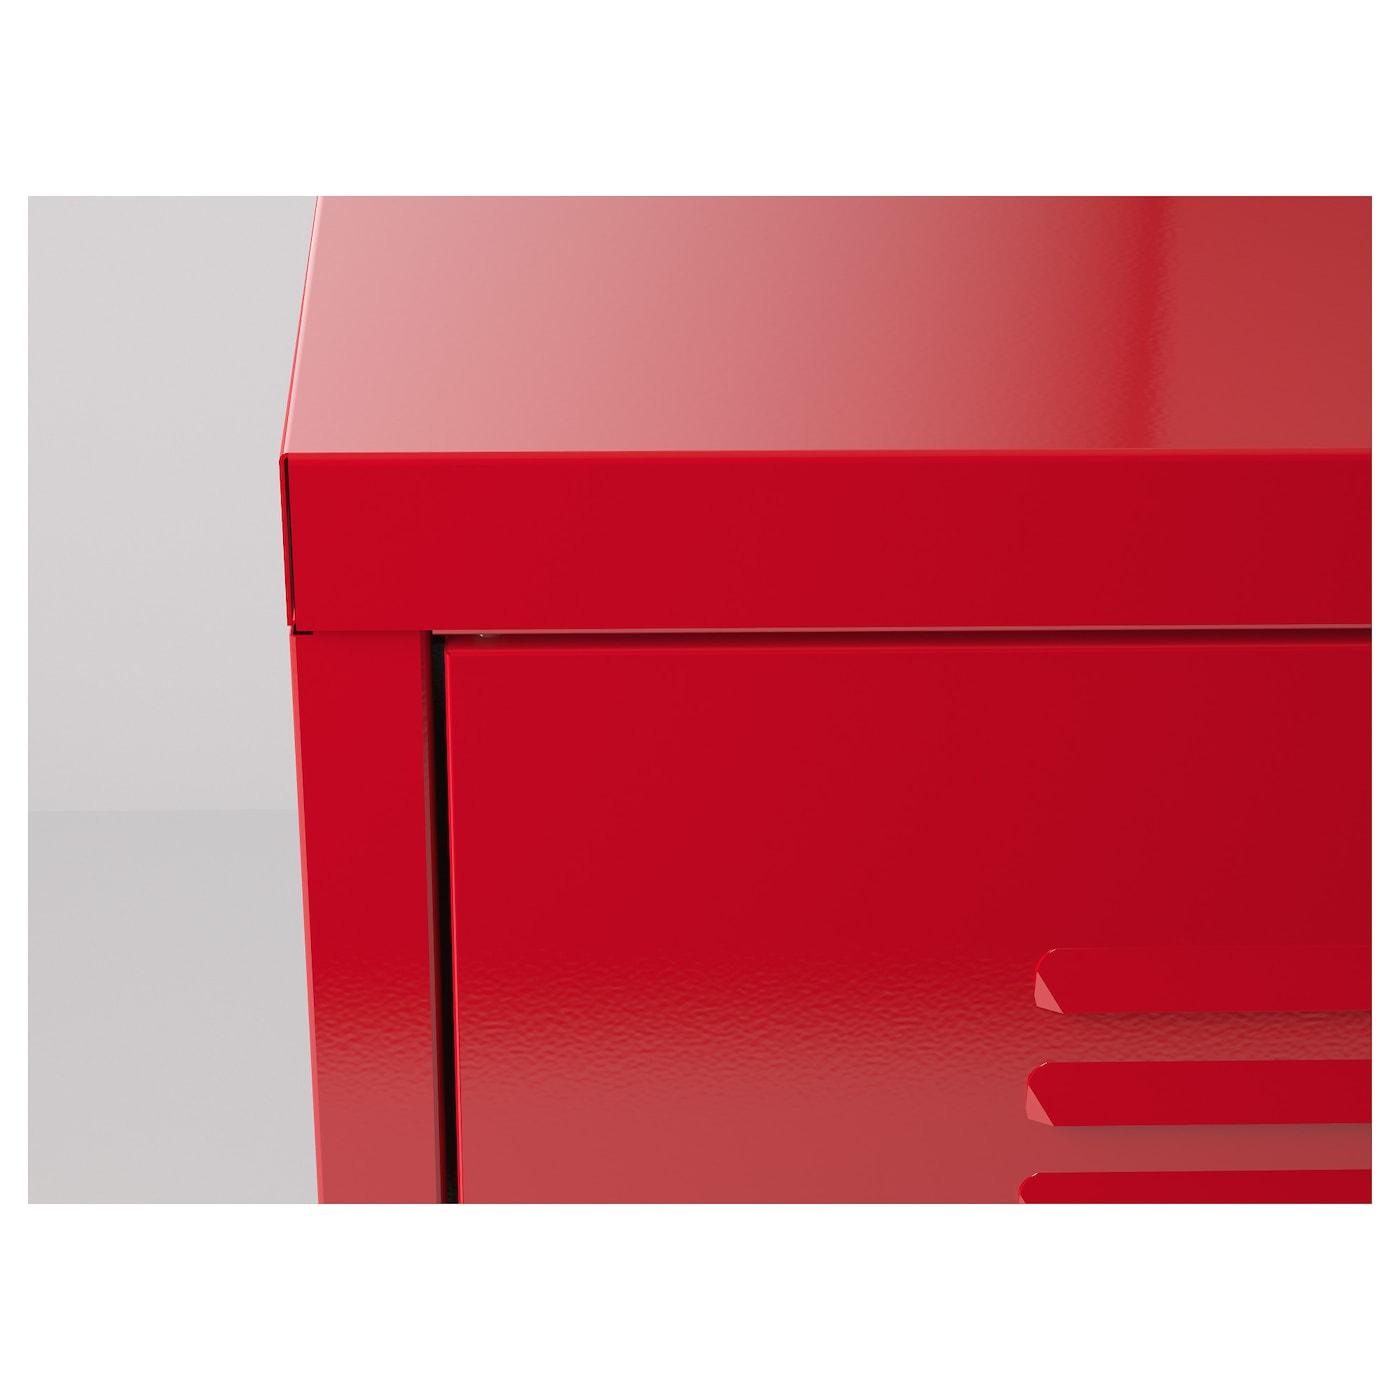 Ikea Ps Cabinet Red 46 7 8x24 3 4 Ikea